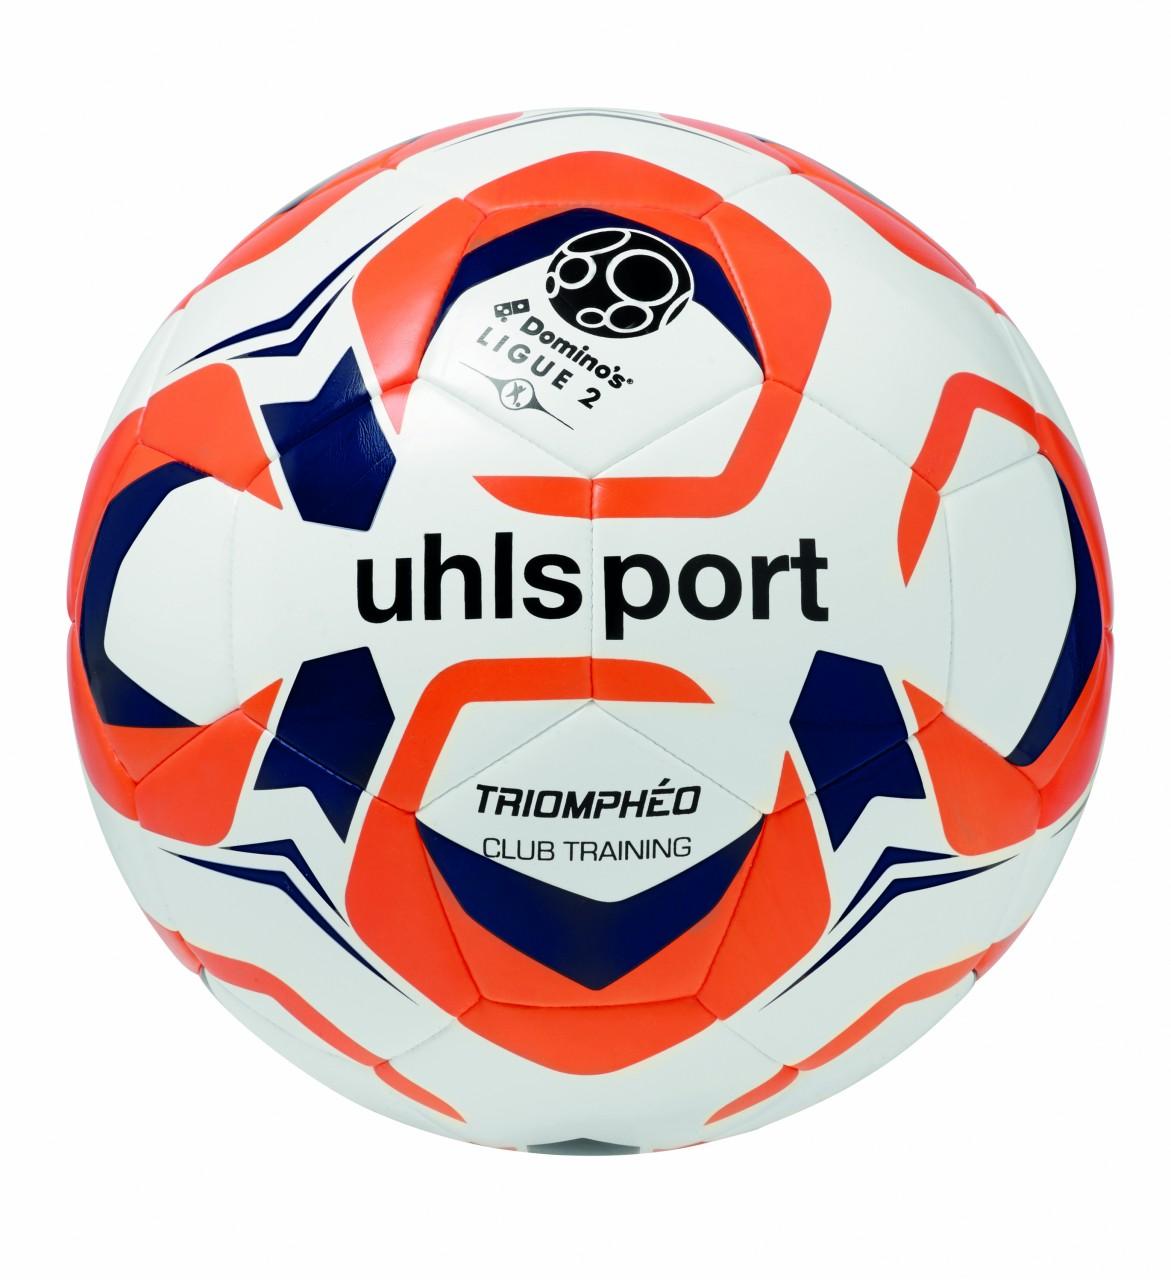 10 x Uhlsport Trainingsball TRIOMPHÉO CLUB TRAINING inkl. Ballsack